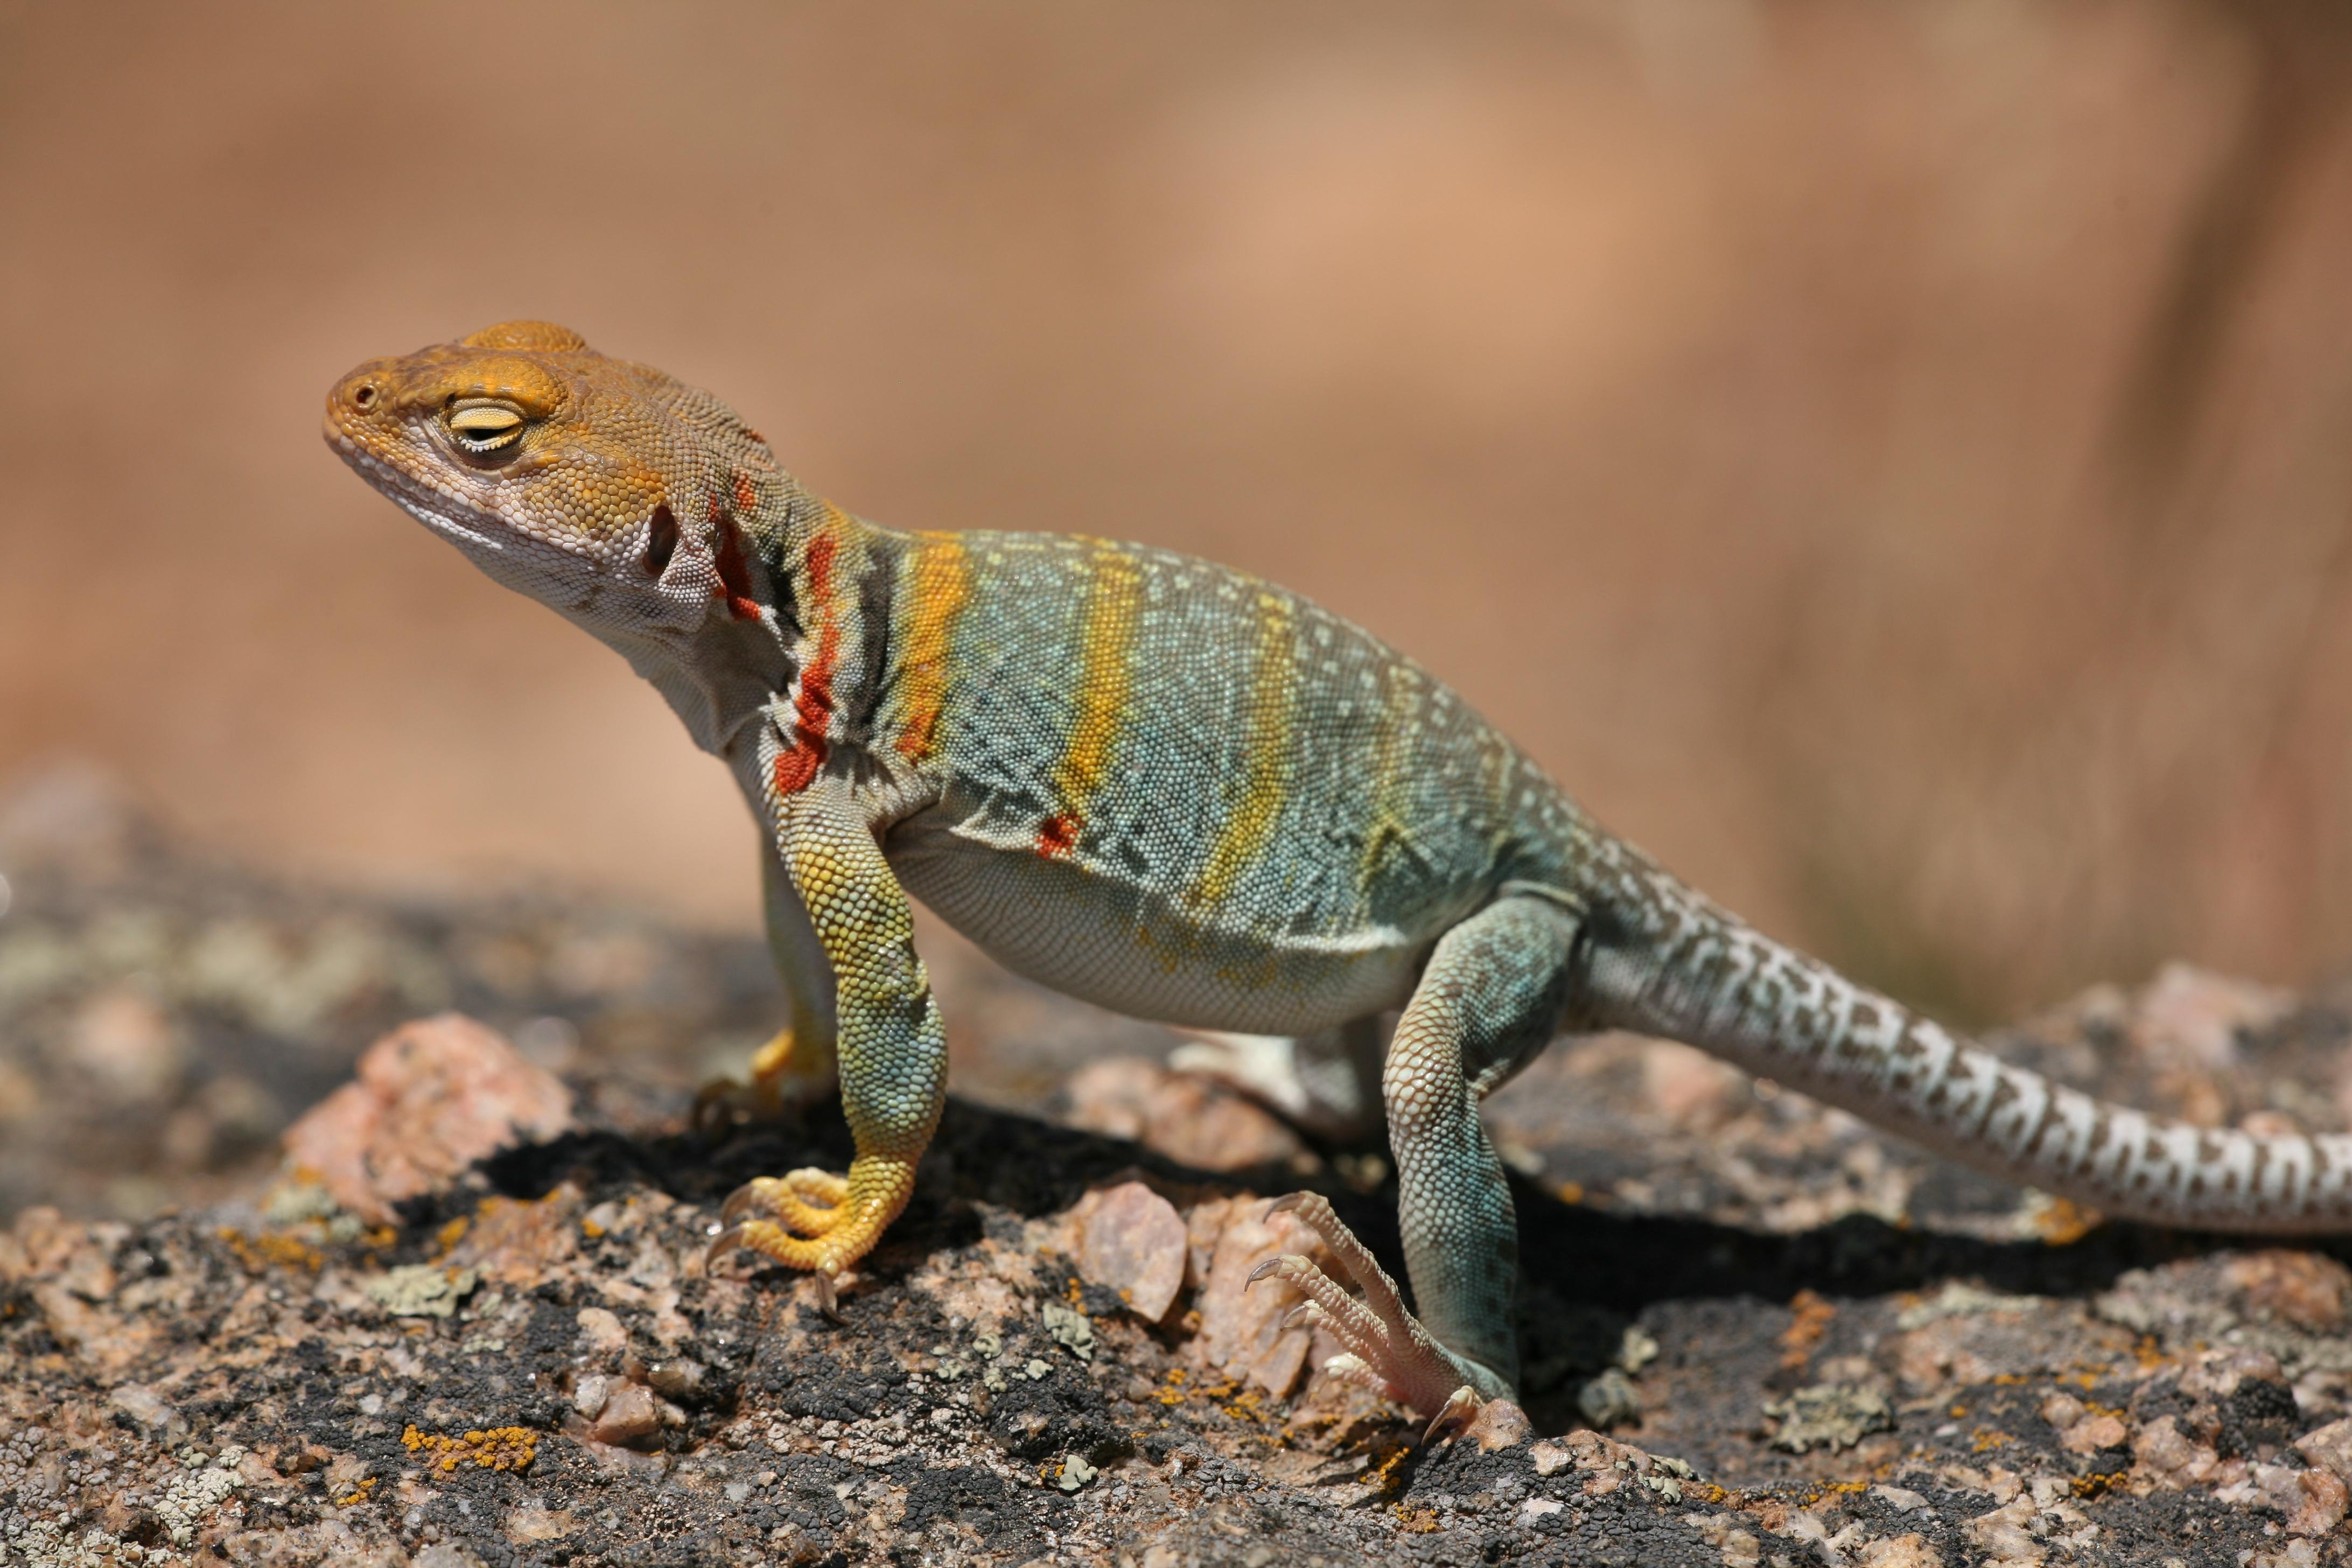 Collared Lizard HD wallpapers, Desktop wallpaper - most viewed